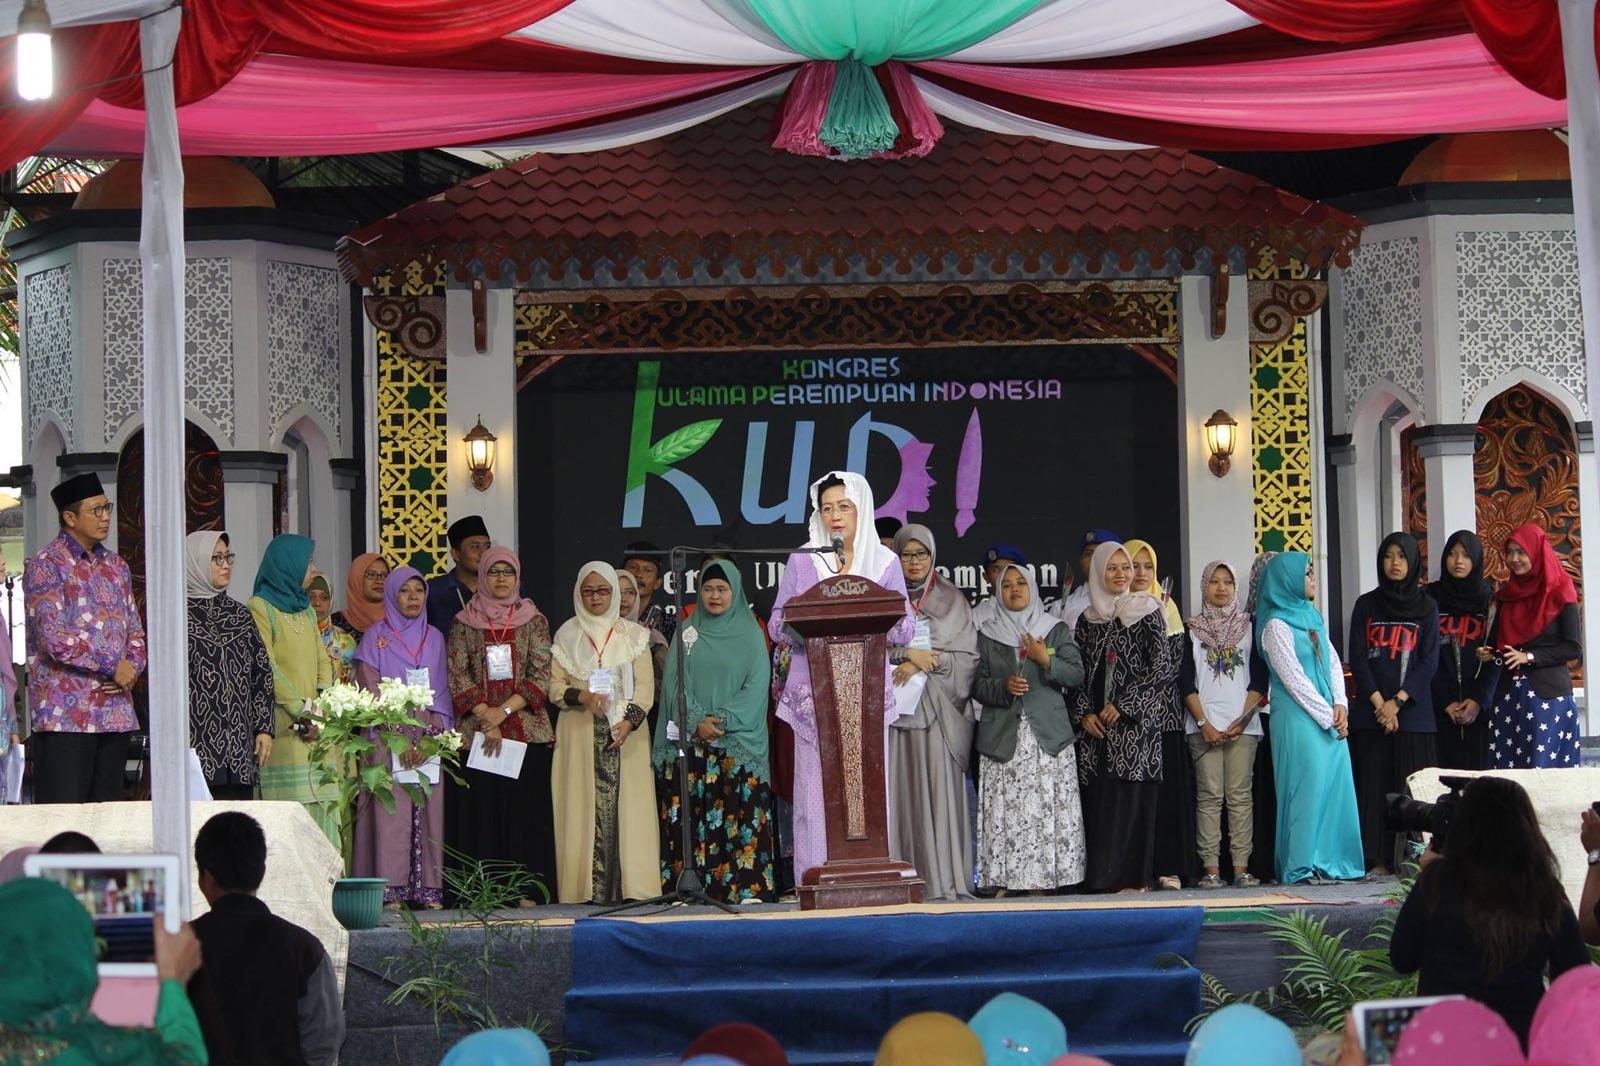 KUPI - New Naratif